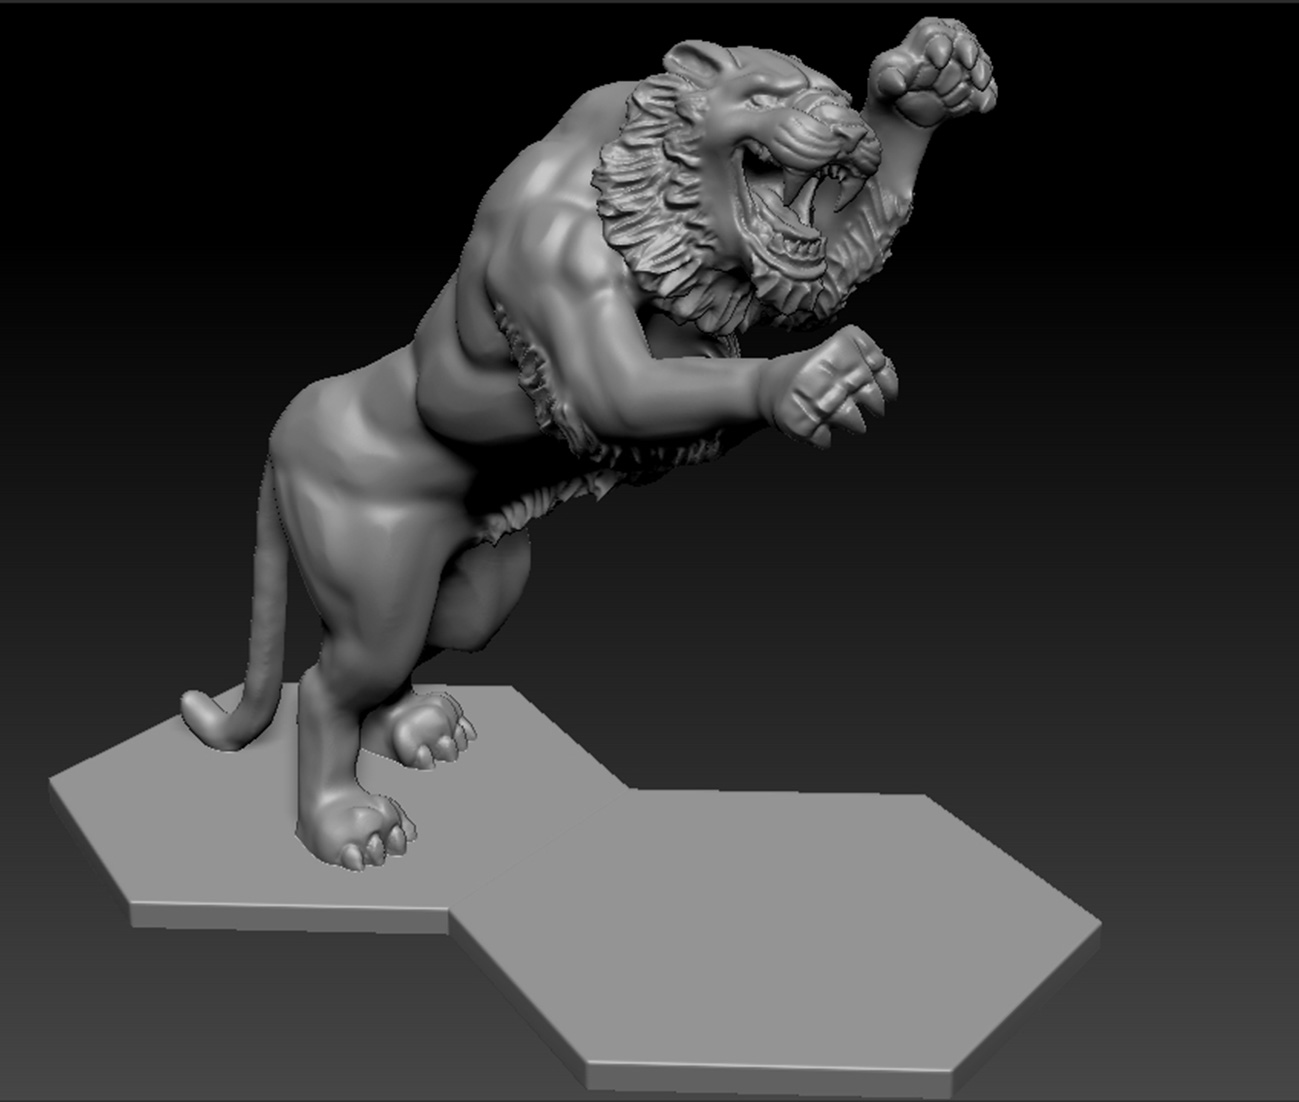 gladiatoris-tigre-en-proceso-1